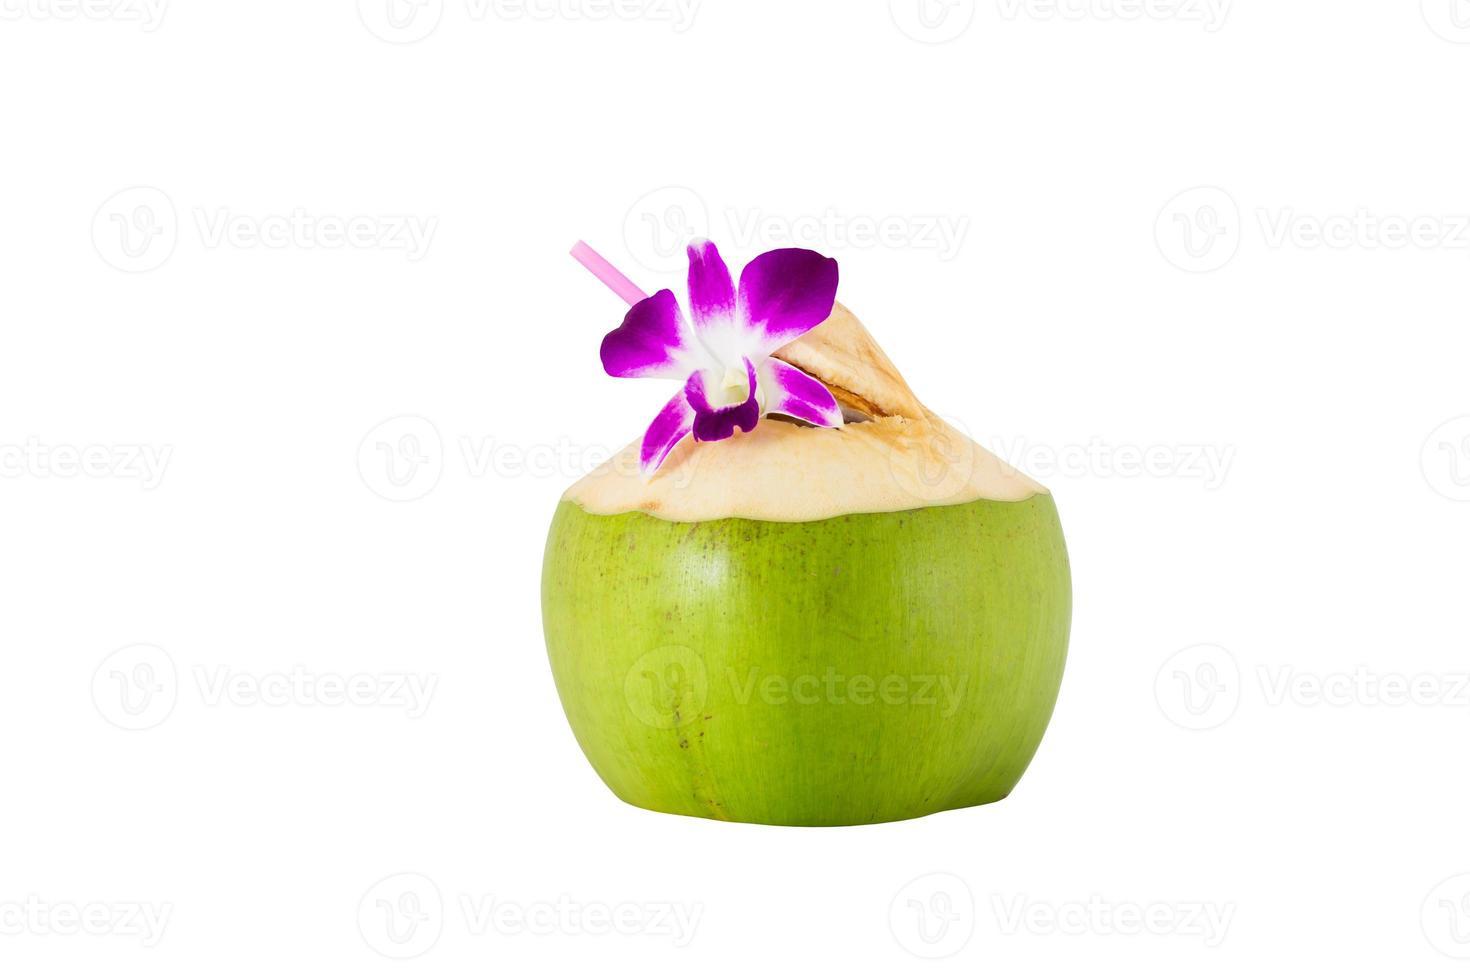 Kokosnuss mit Trinkhalm foto